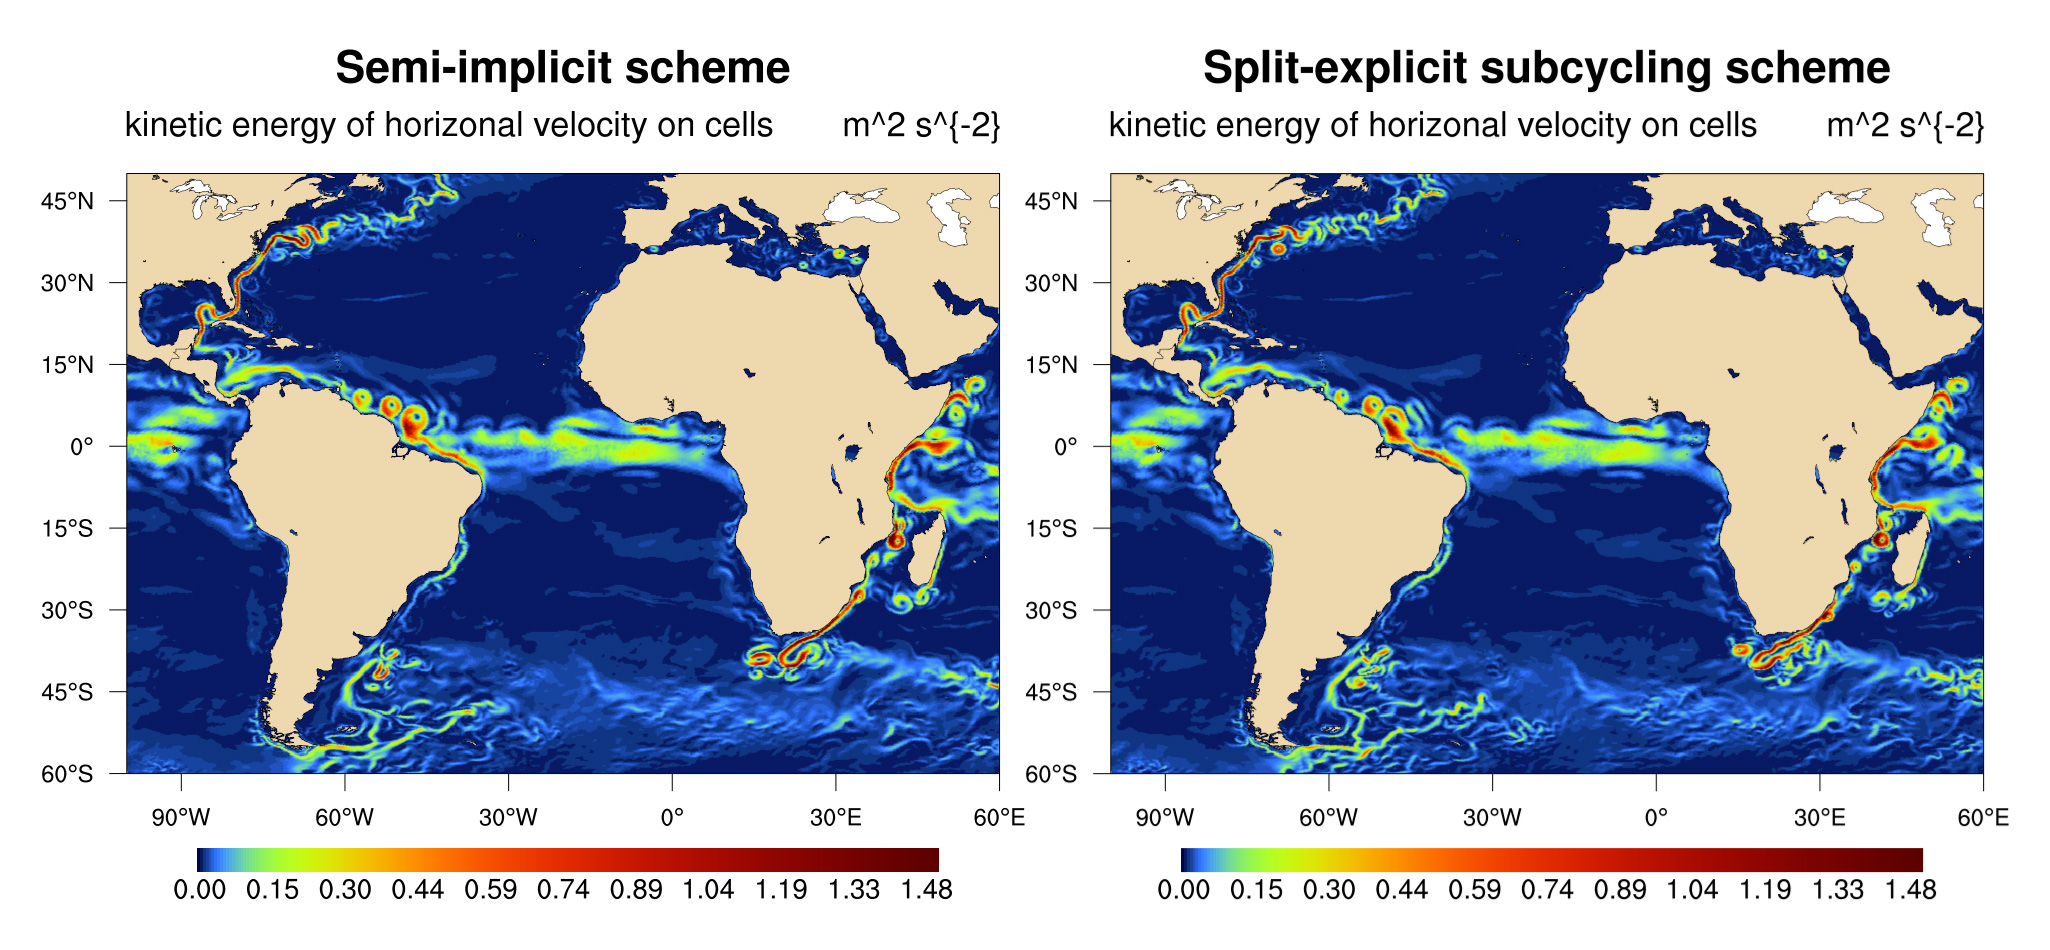 Comparison of semi-implicit and split-explicit ocean modeling schemes